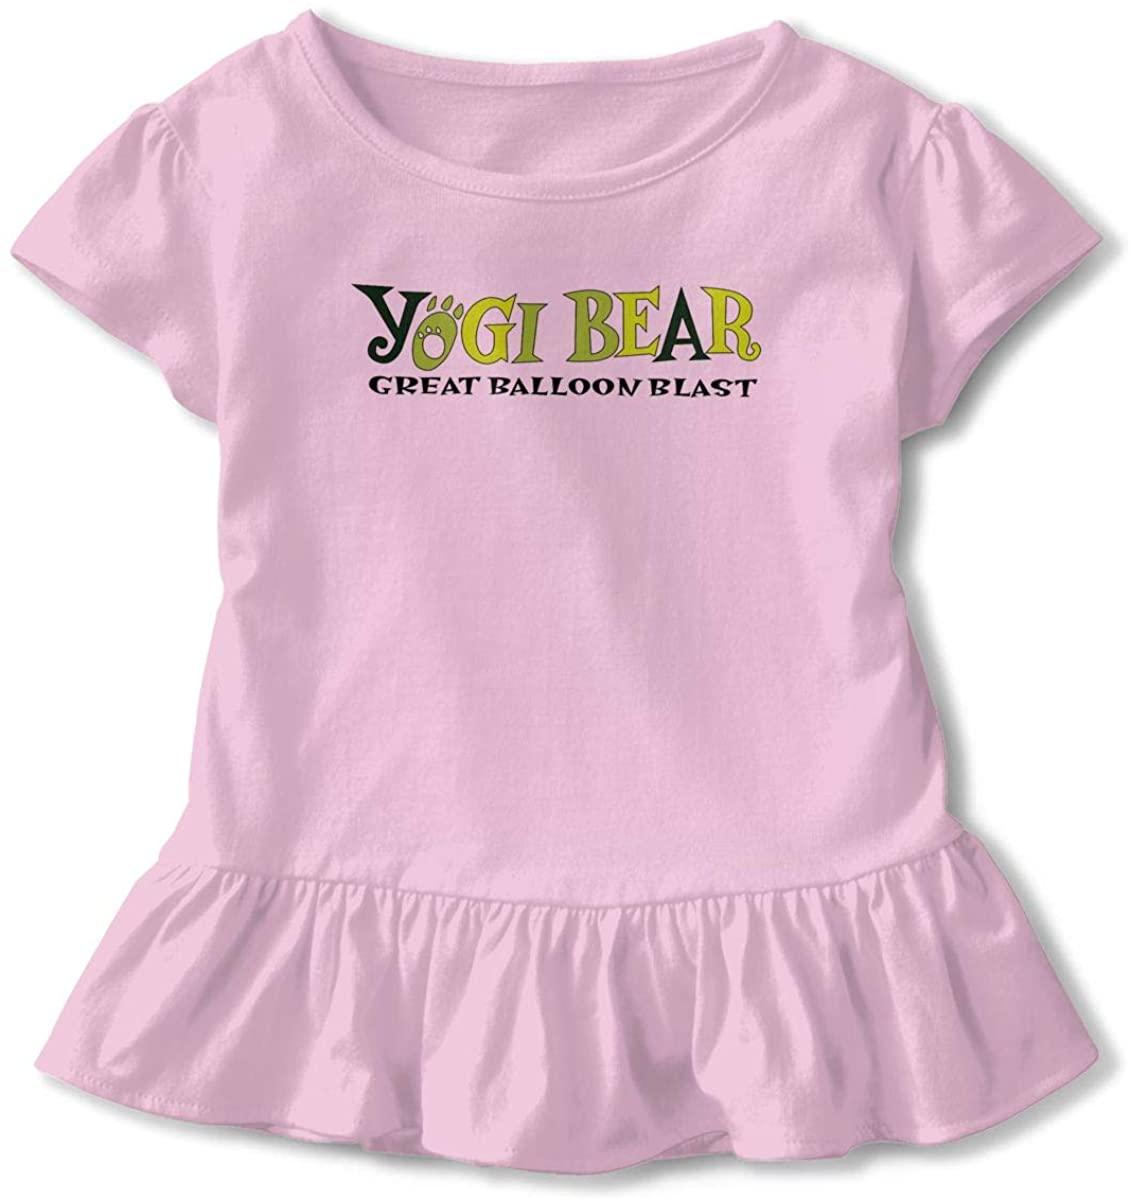 Yogi-Bear Animals 2-6 T Baby Girls' Short Sleeve with Hemmed Double Ruffle for Girl